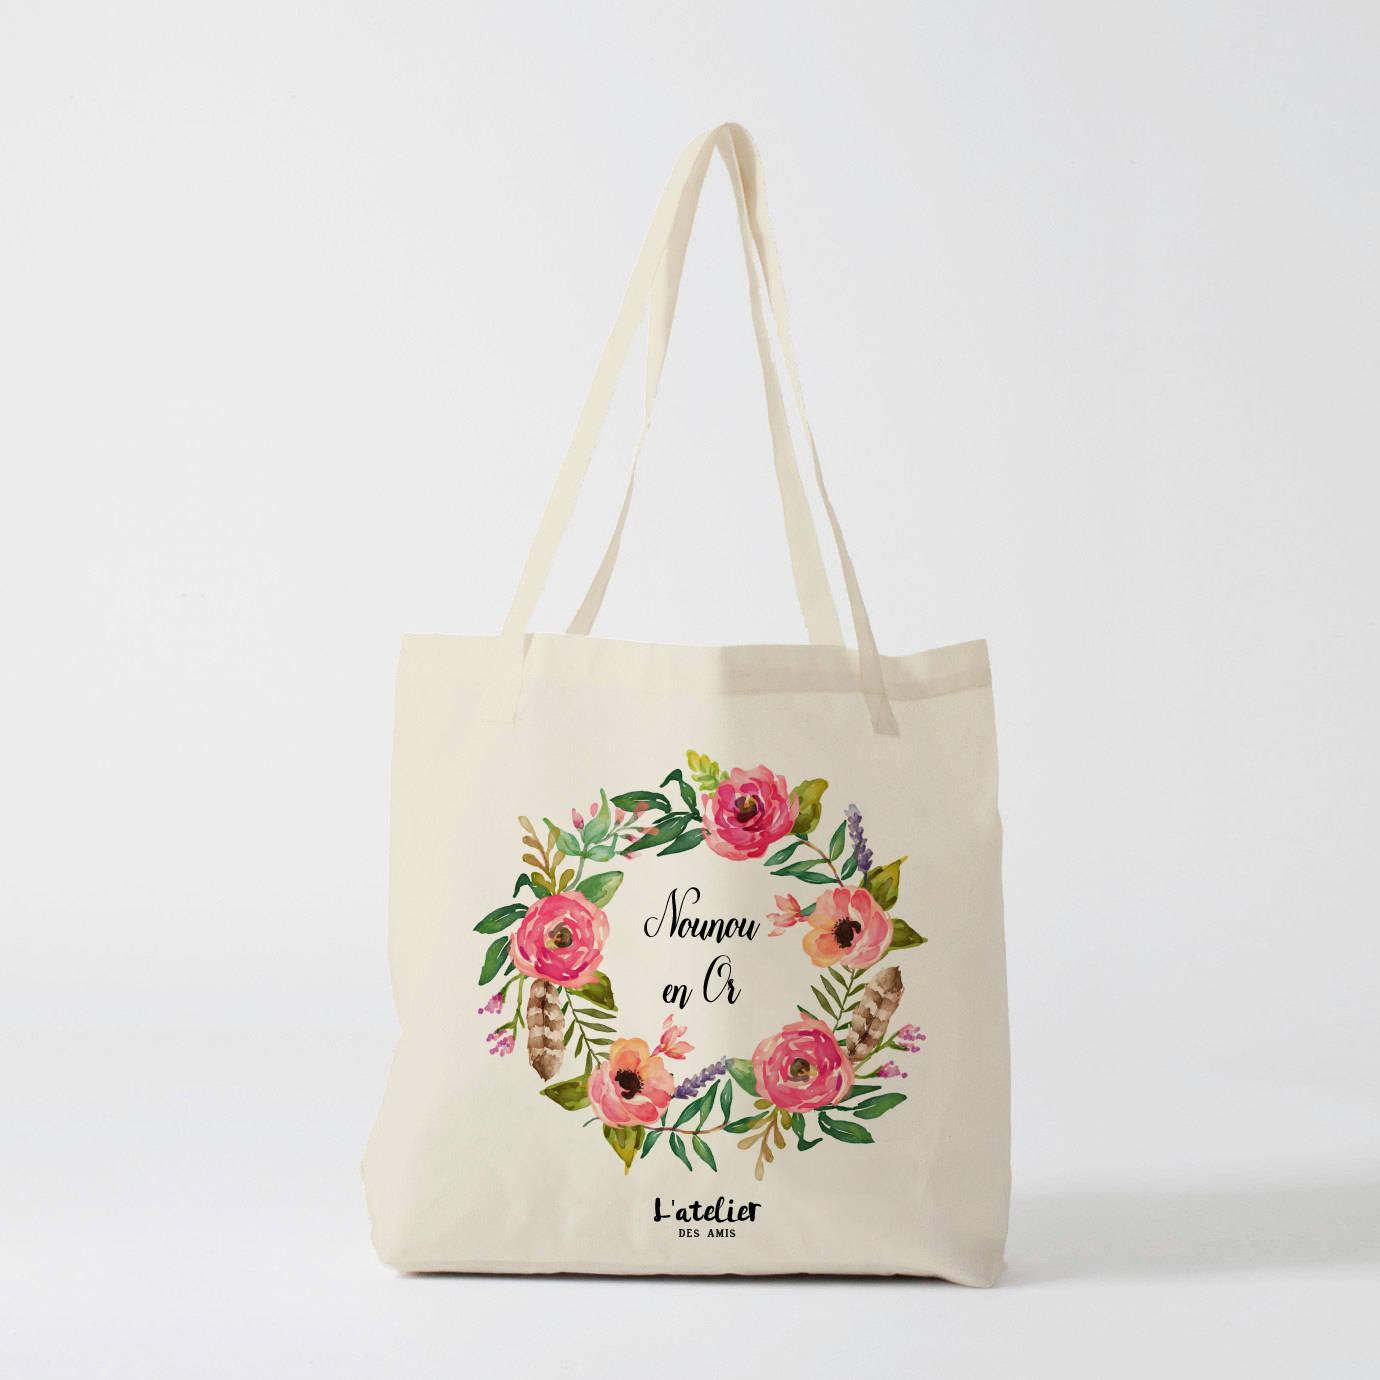 w125y tote bag personnalis sac de toile cabas sac etsy. Black Bedroom Furniture Sets. Home Design Ideas